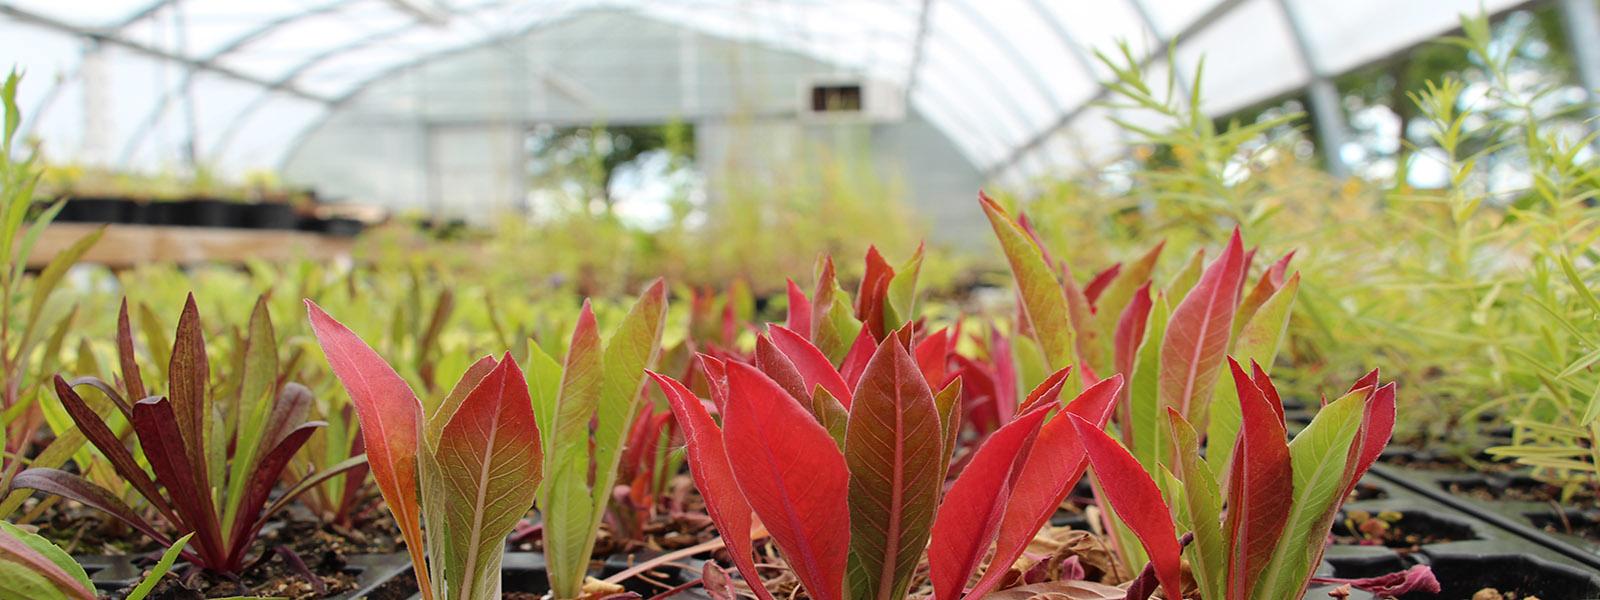 Reuthinger Native Plant Greenhouse